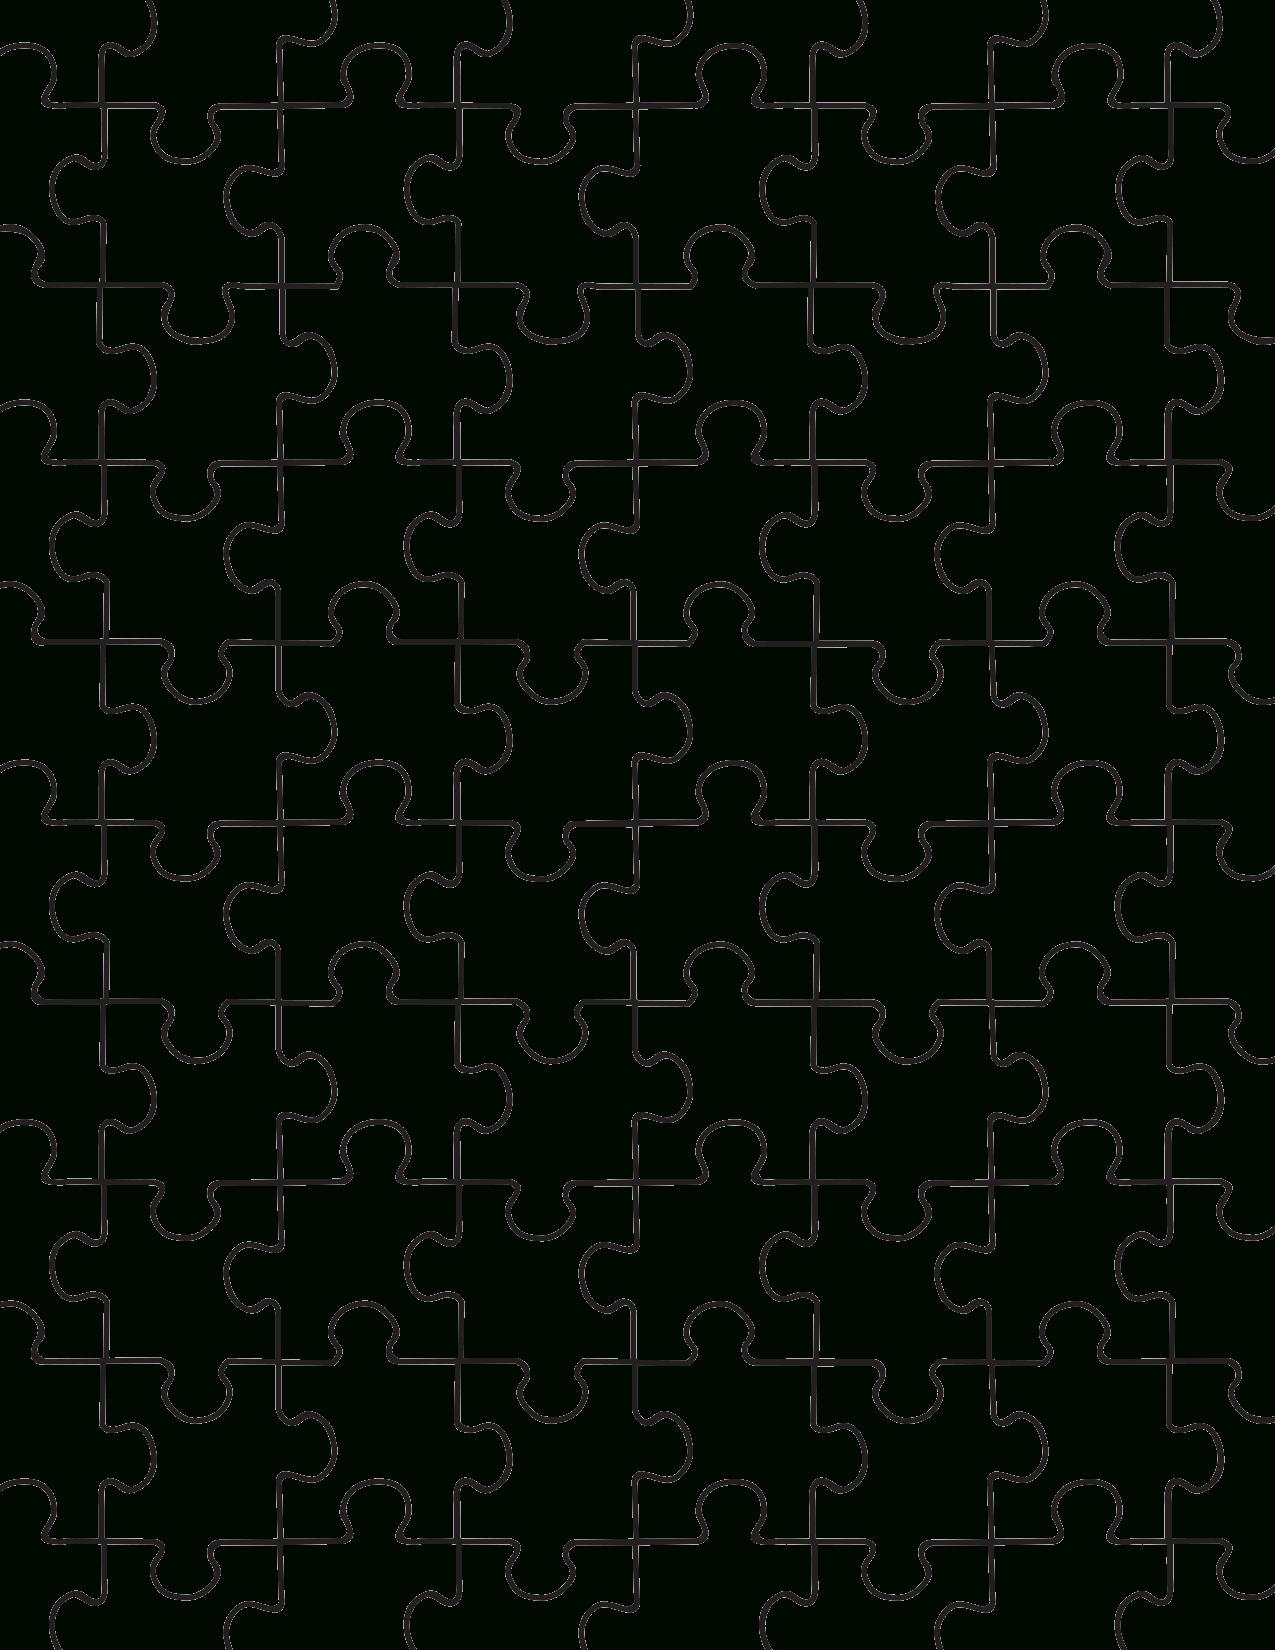 Printable Puzzle Pieces Template | Lovetoknow - Printable Puzzles Template